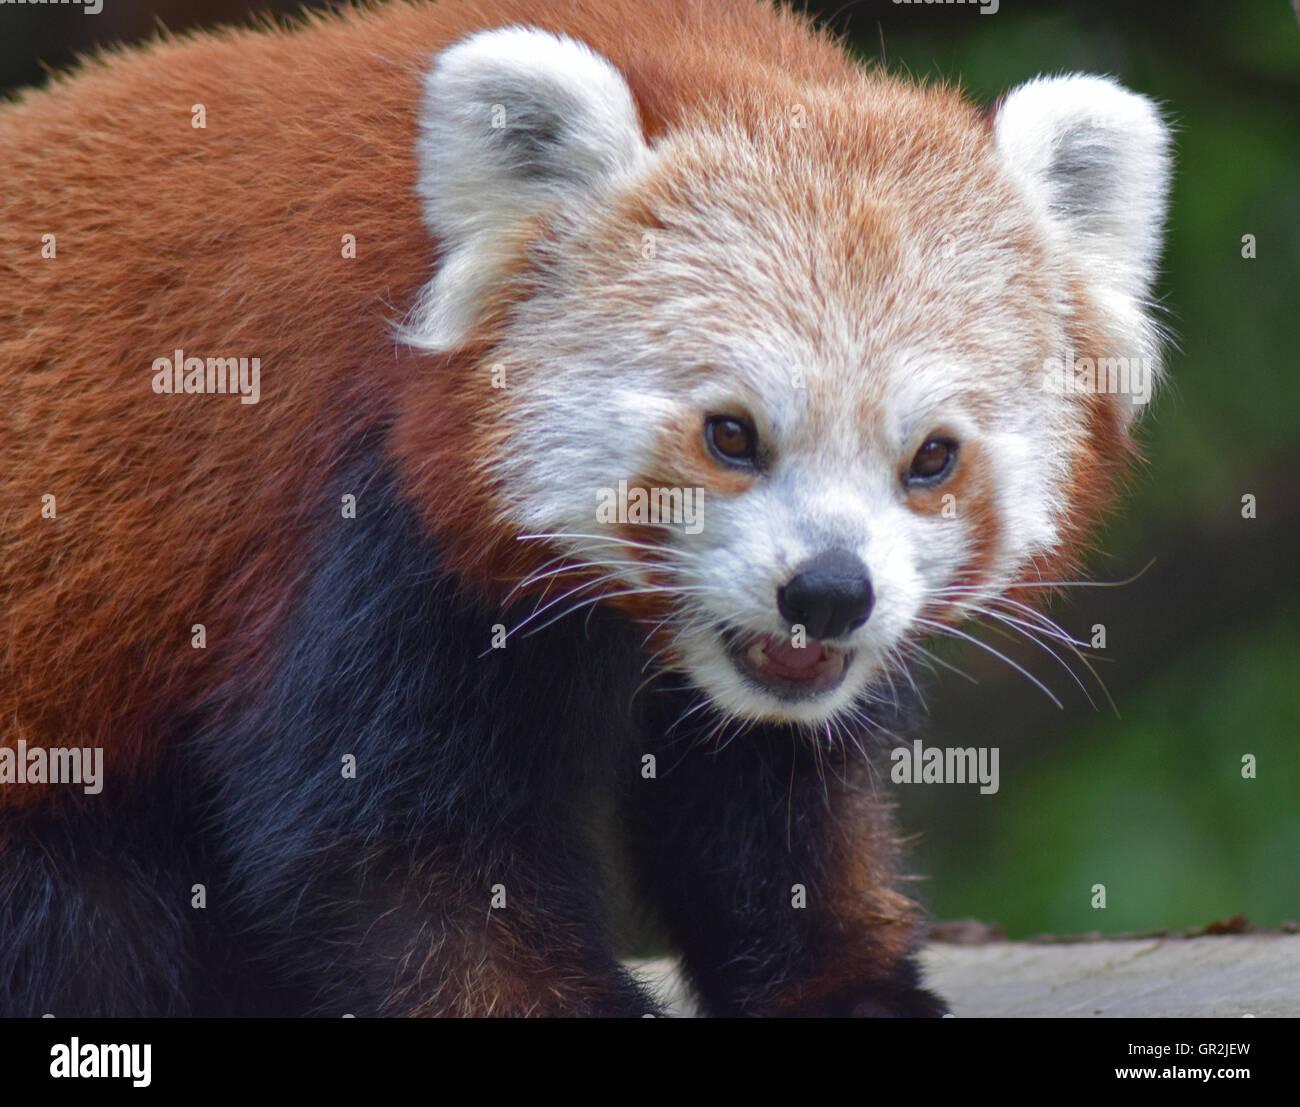 Red Panda - Highland Wildlife Park Stock Photo